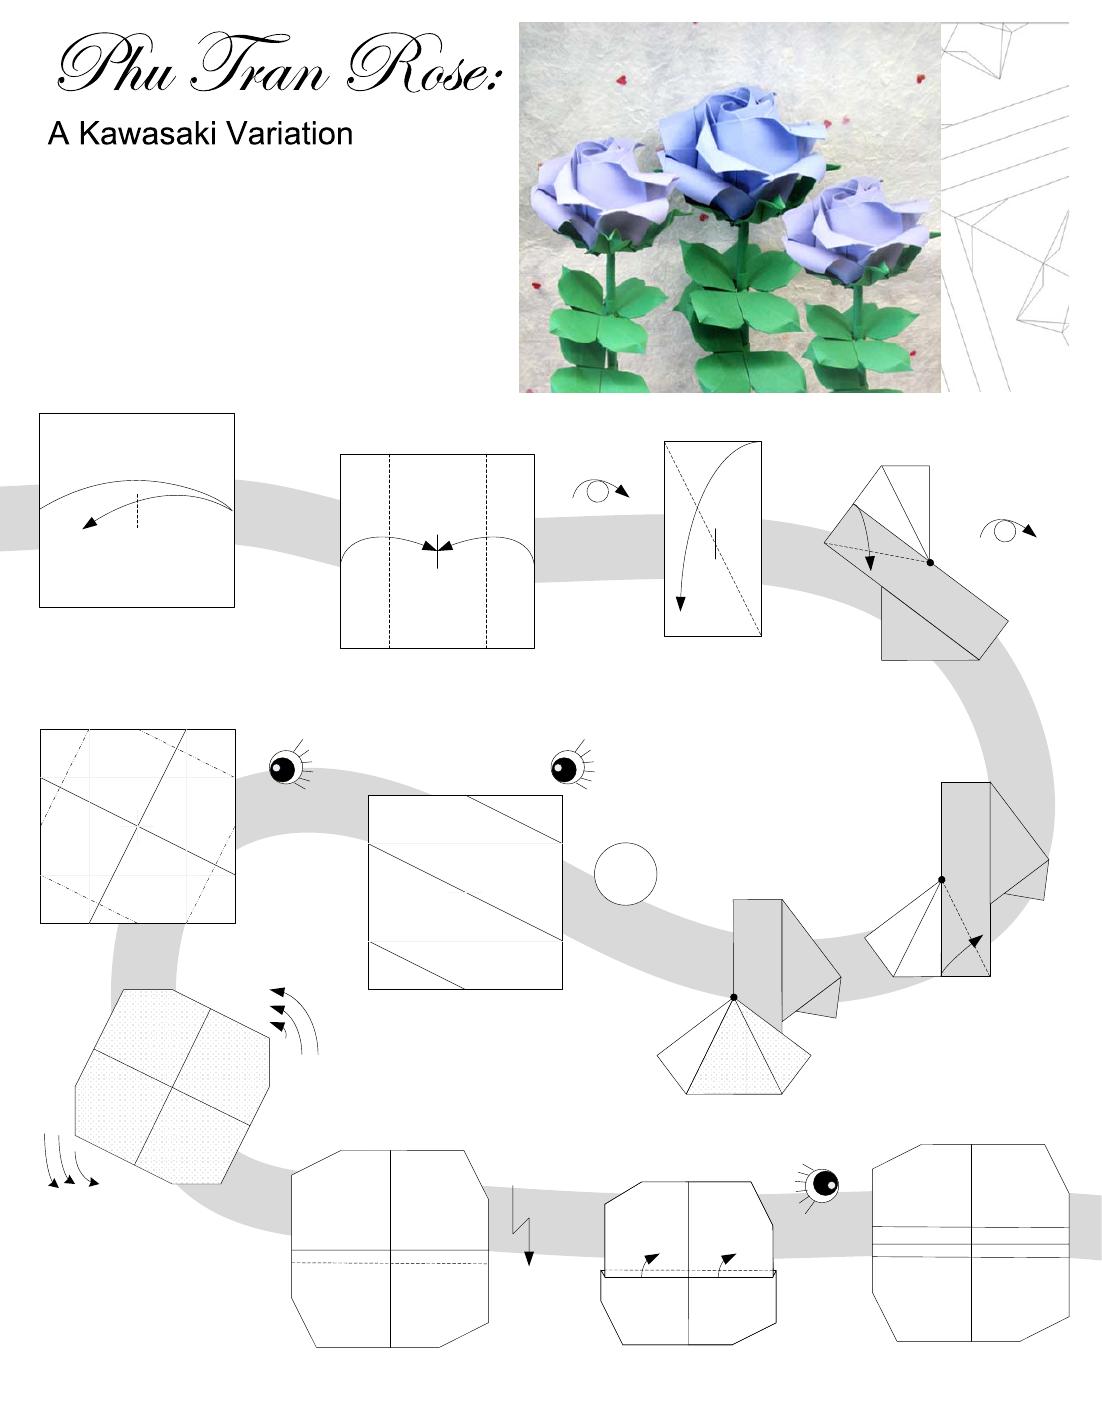 hight resolution of origami rose diagram phu tran rose origami roses origami origami kawasaki rose diagrams origami pinterest